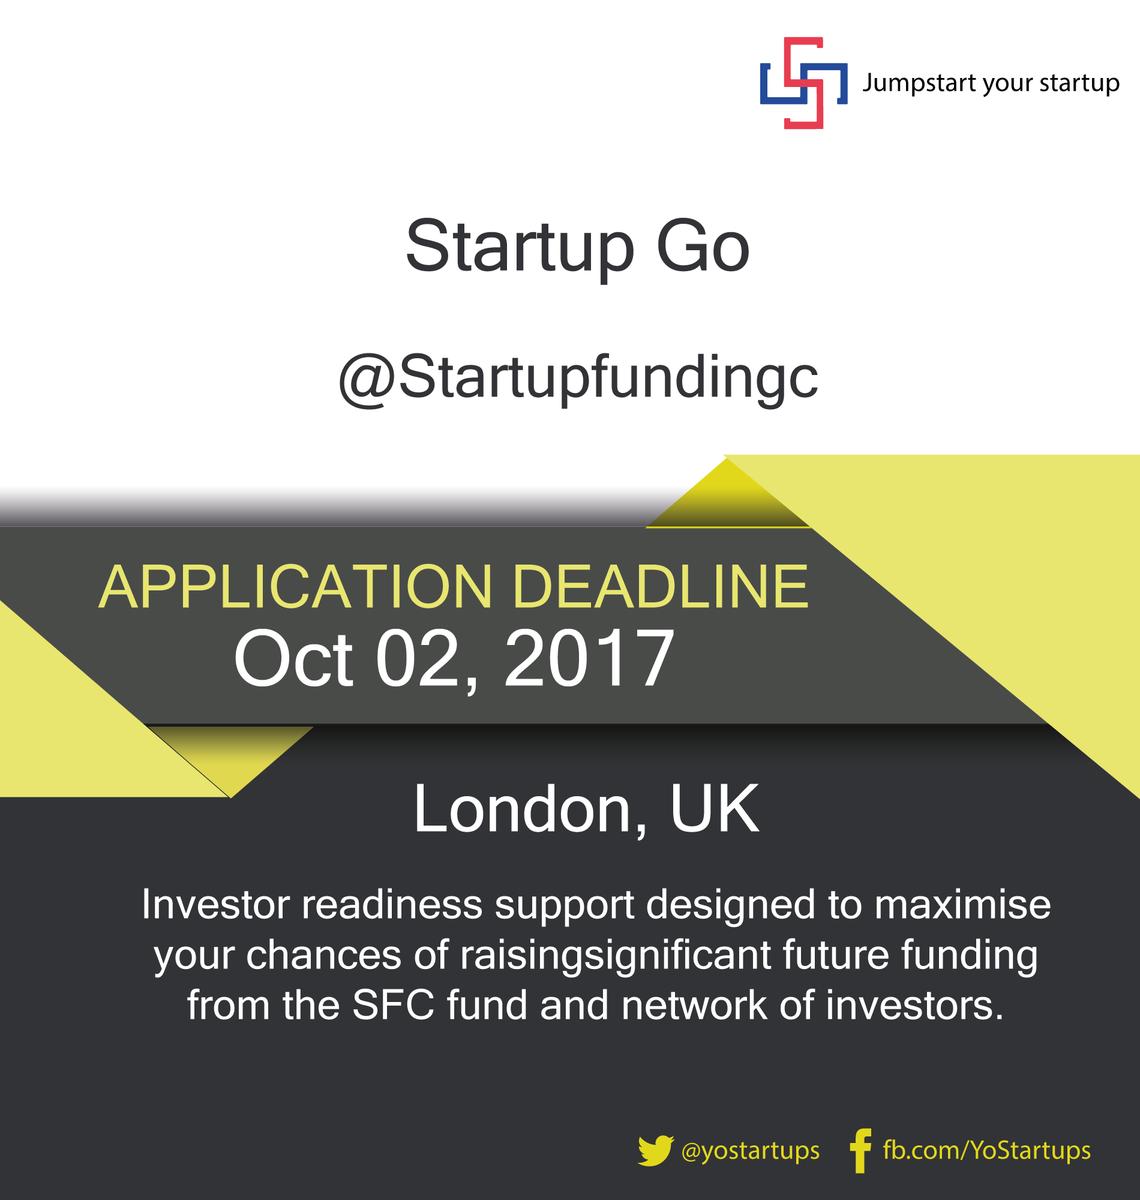 Checkout @Startupfundingc exciting new initiative for early-stage entrepreneurs #Startups #accelerator #YoStartups  https:// goo.gl/MFrLsx  &nbsp;  <br>http://pic.twitter.com/NdZdIMpwRz